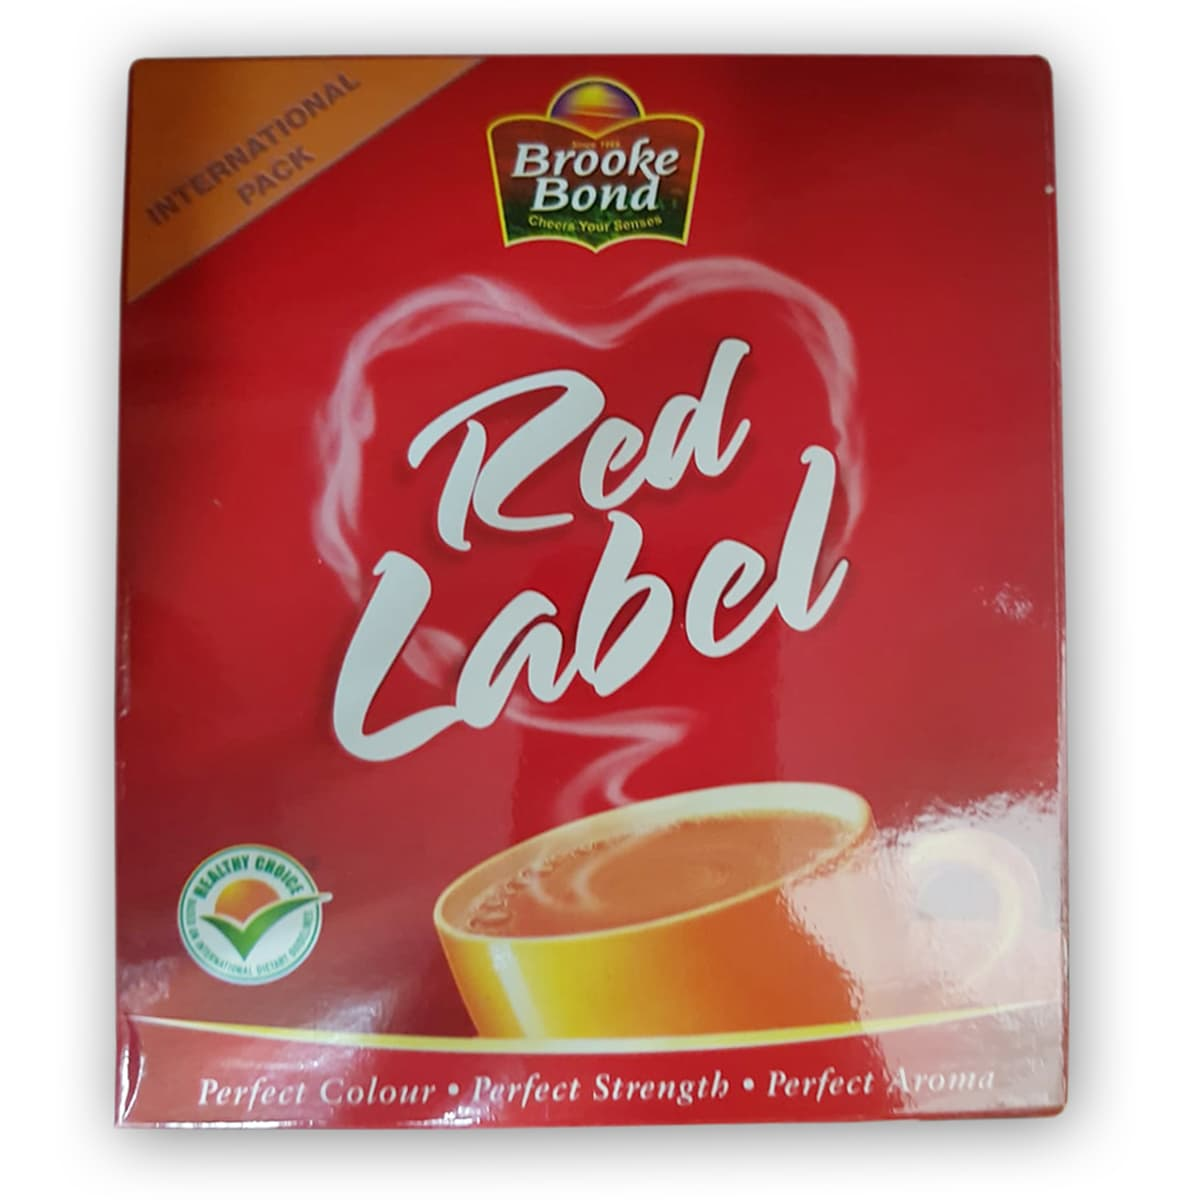 Buy Brooke Bond Red Label Tea (Loose Tea) - 450 gm